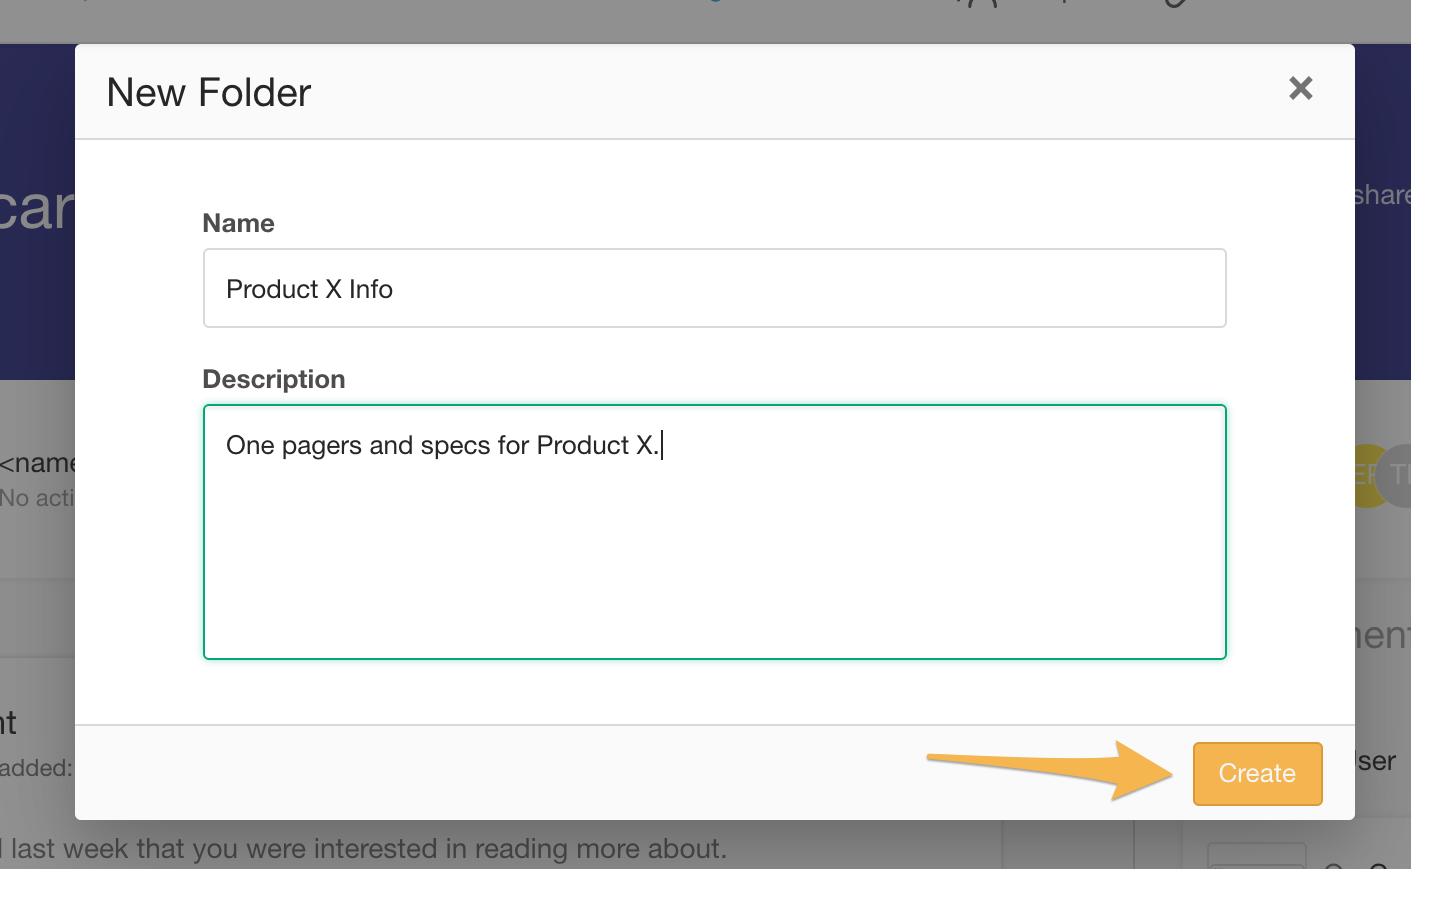 create_a_folder_3.png